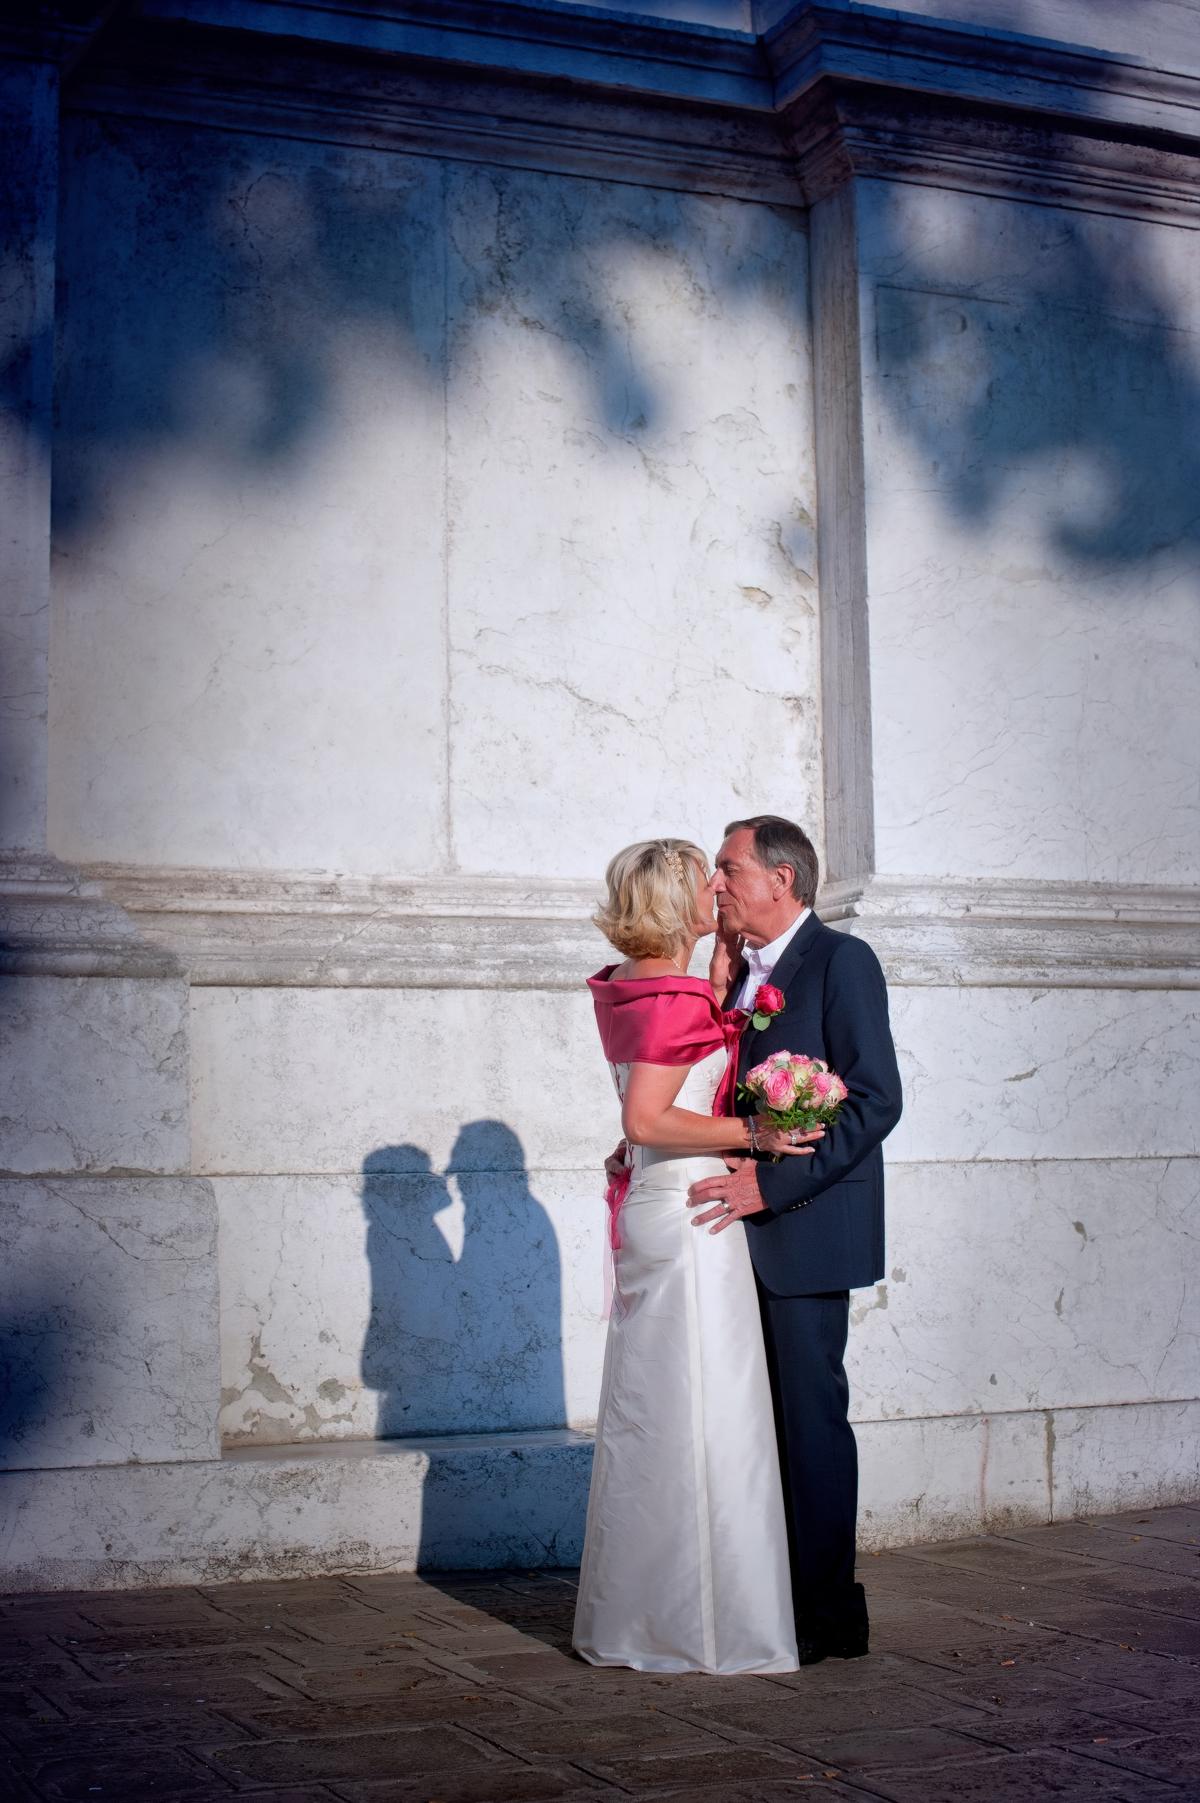 photographer wedding venice photographe mariage venise laure jacquemin (89).jpg